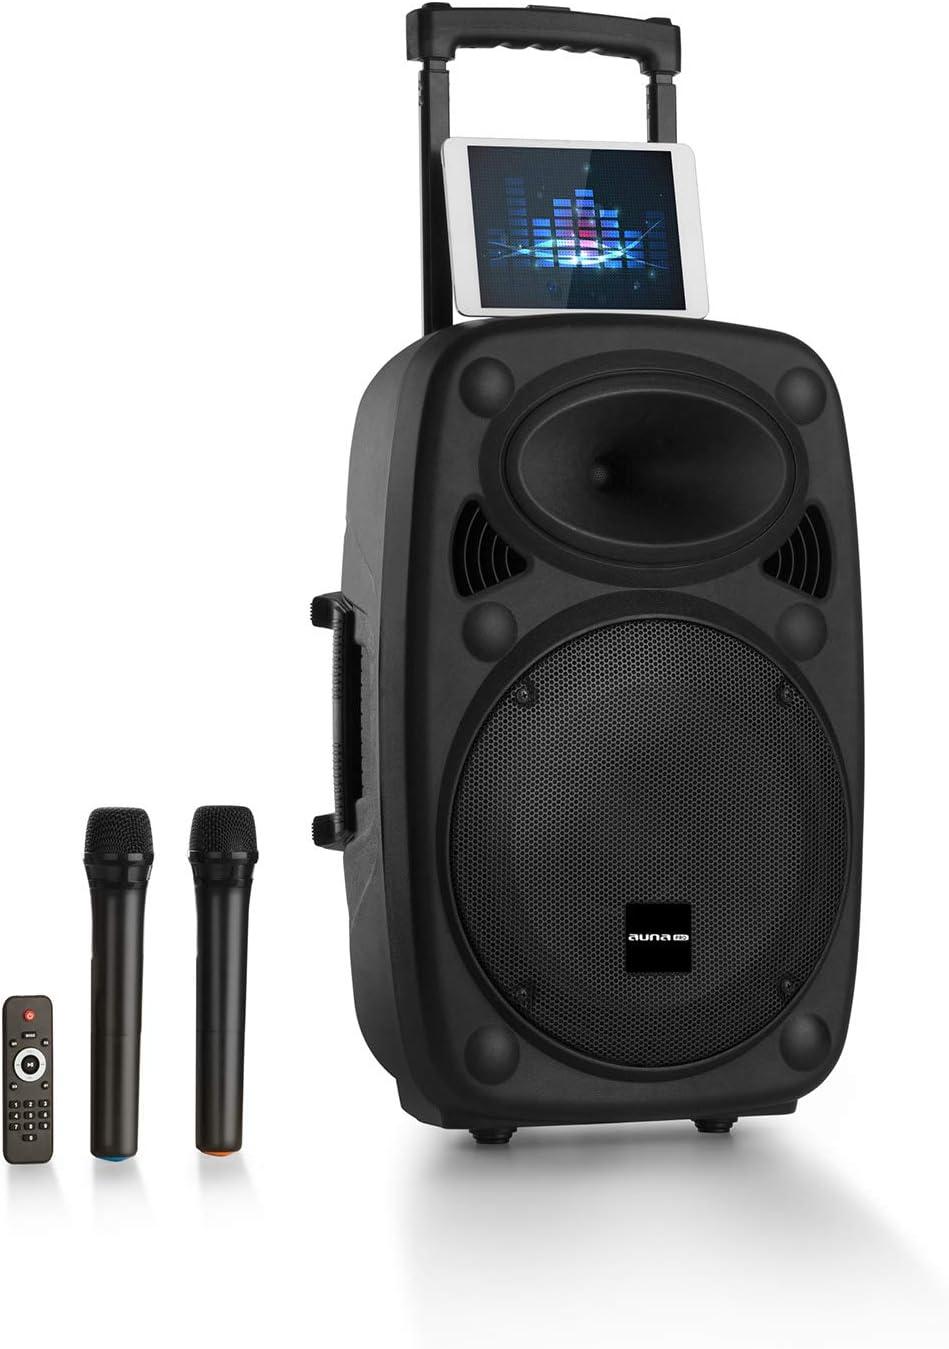 auna Streetstar 2.0 - Equipo PA portátil, Altavoz DJ, Bluetooth, Puerto USB, SD, MP3, AUX, Batería 3 Ah, LED, 2 micrófonos UHF, Mando a Distancia, Subwoofer 15